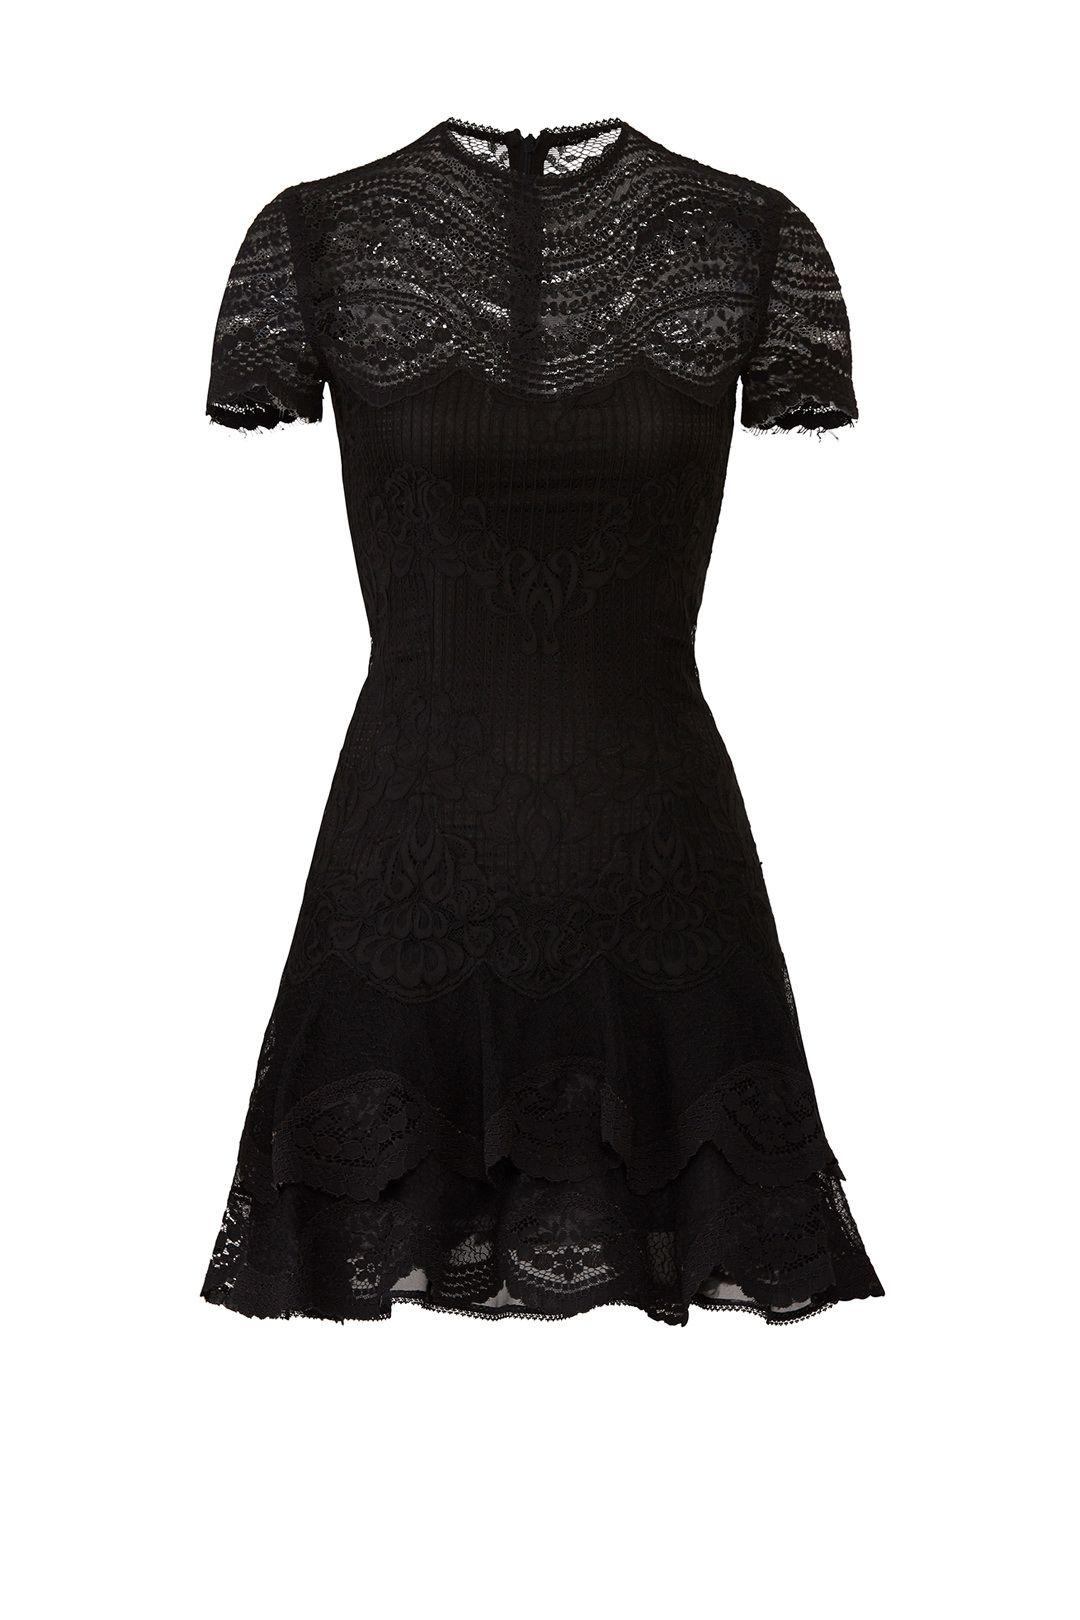 cb819d1c831a6 Mixed Lace Mini Dress by Jonathan Simkhai for  105